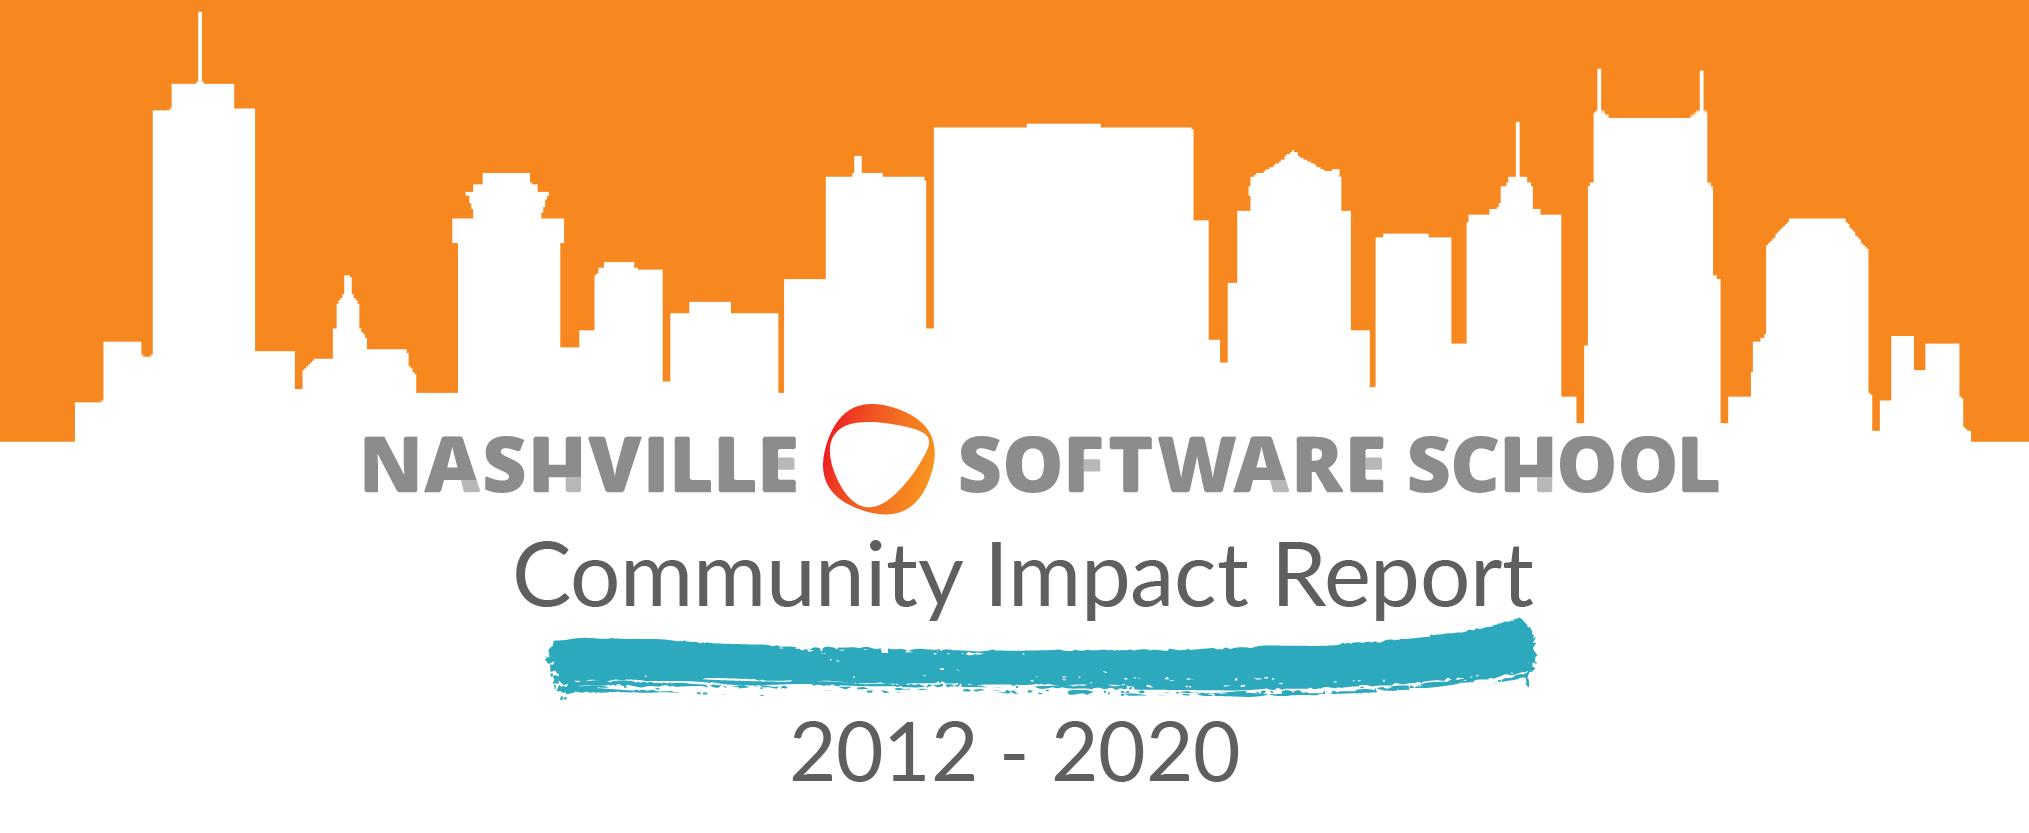 Community Impact Report 2012-2020